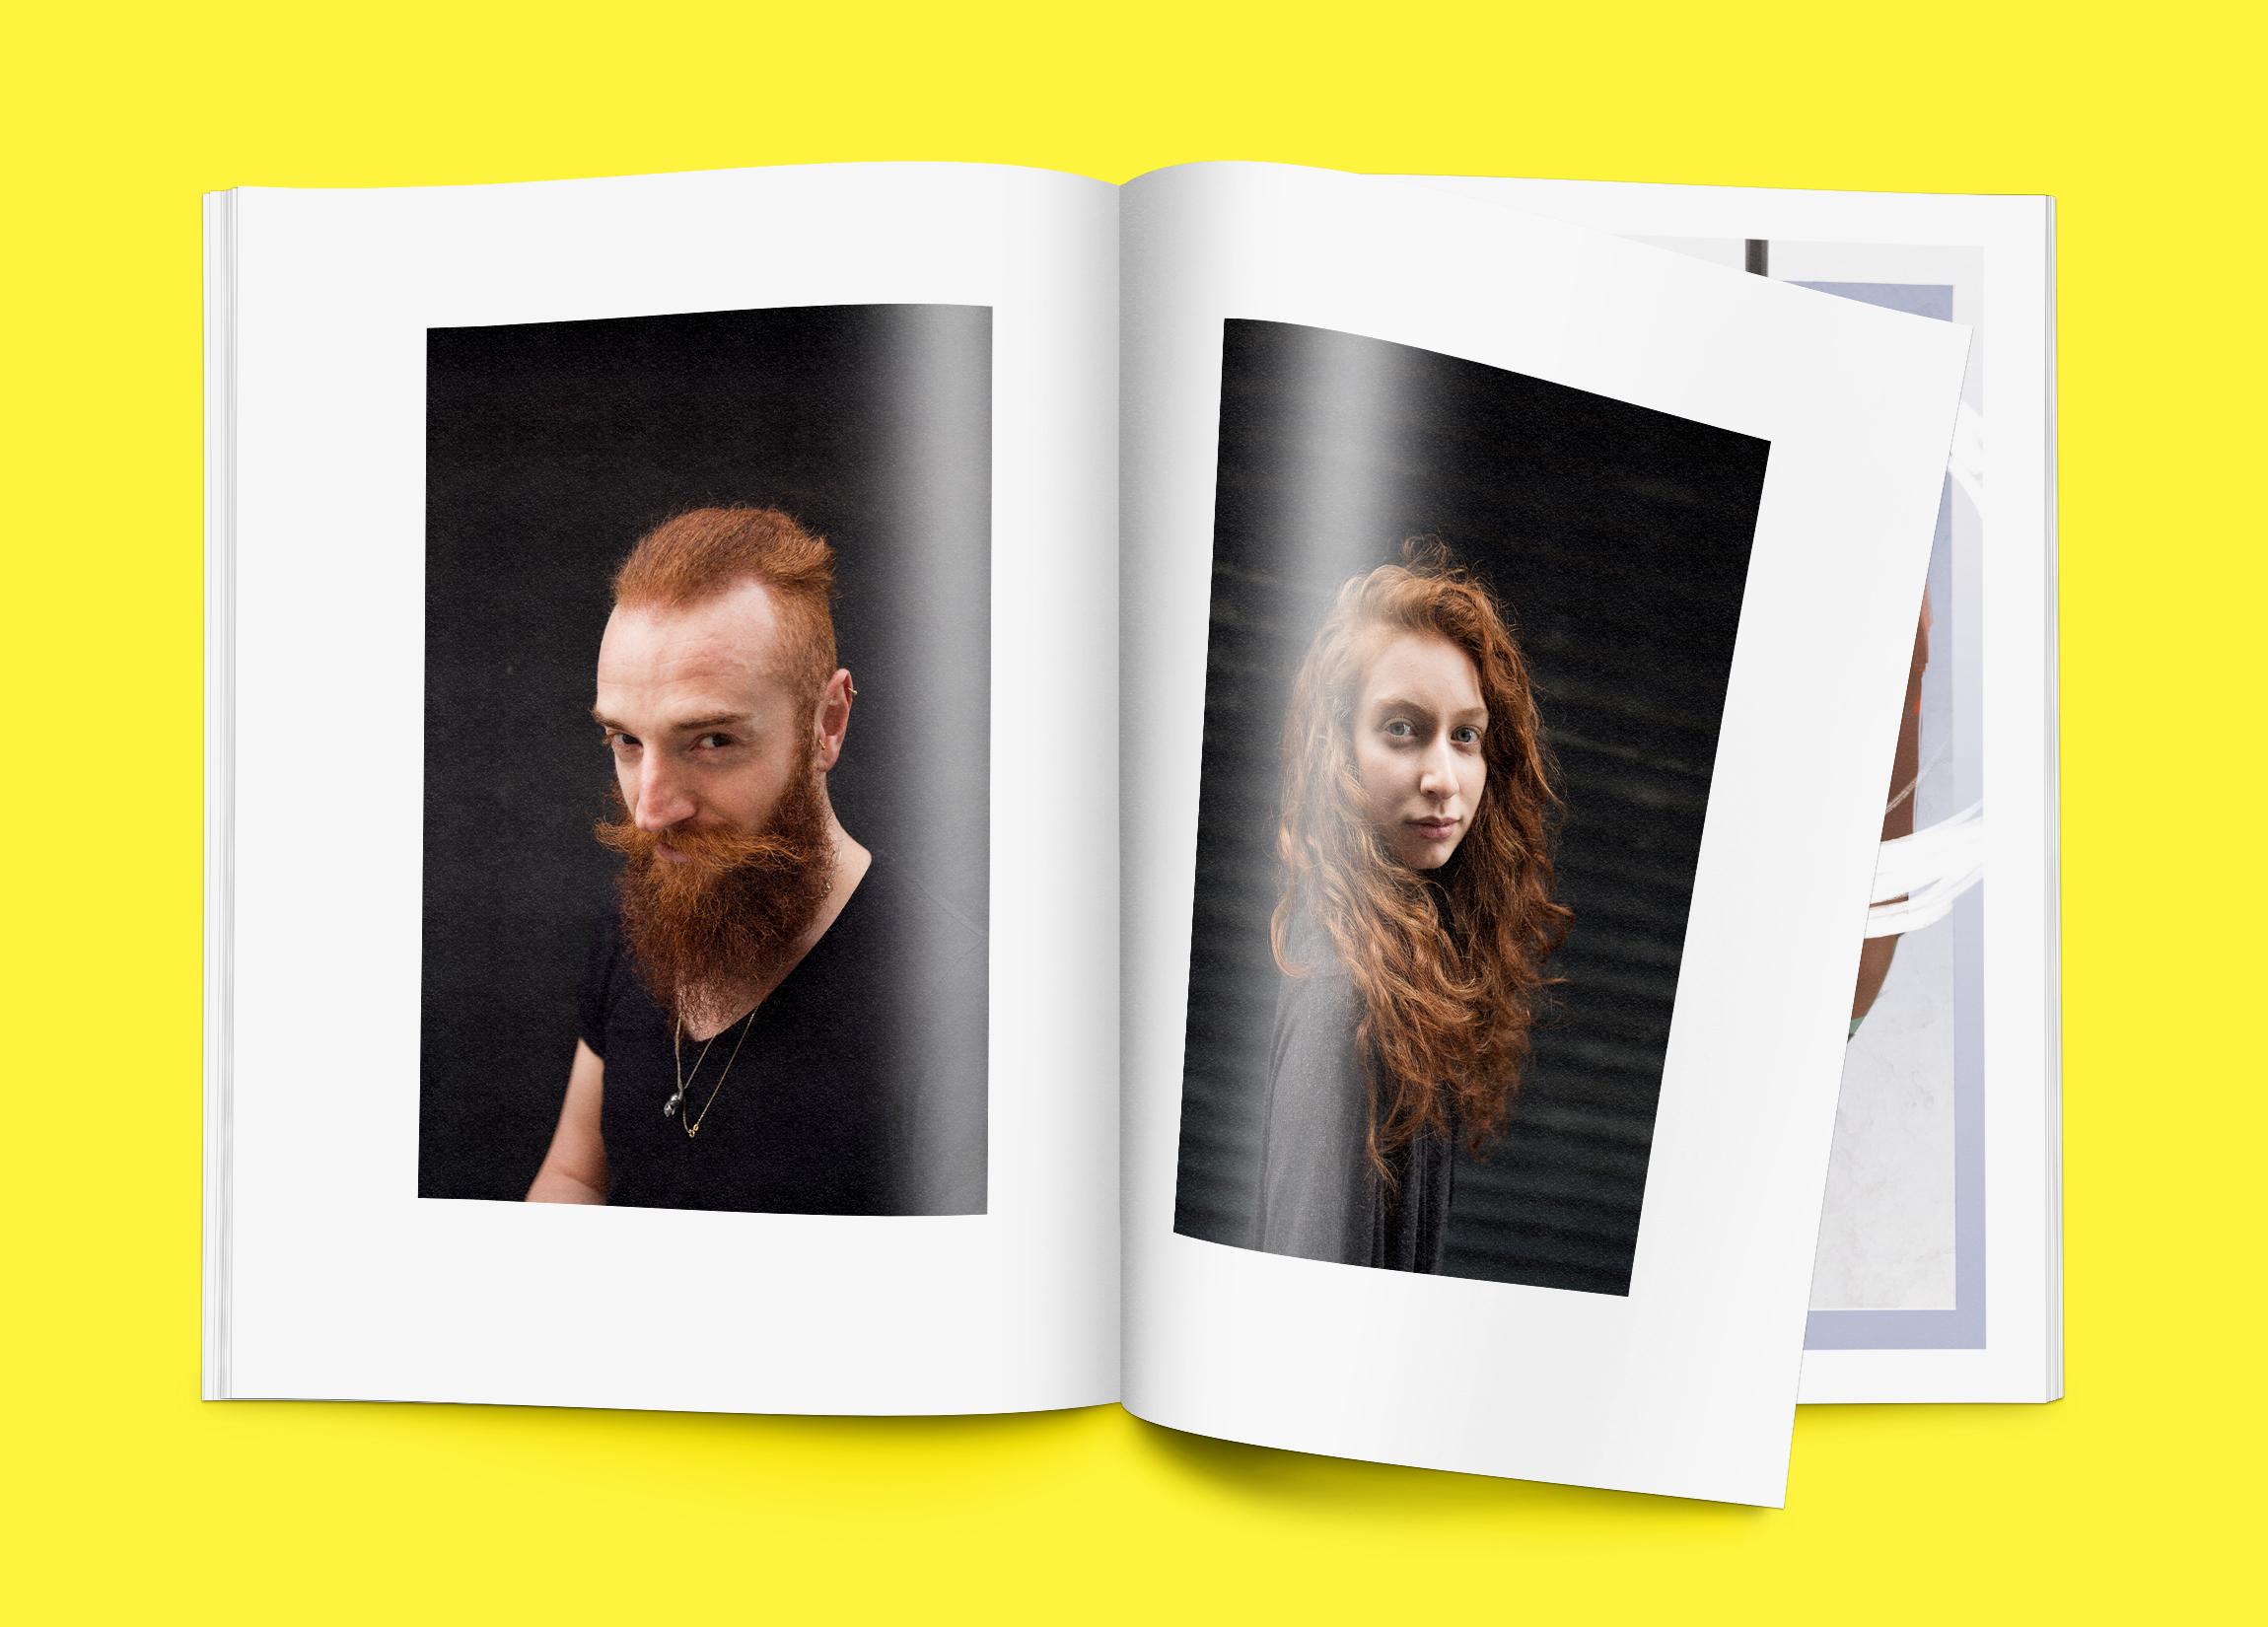 renk_mockup_redheads_02